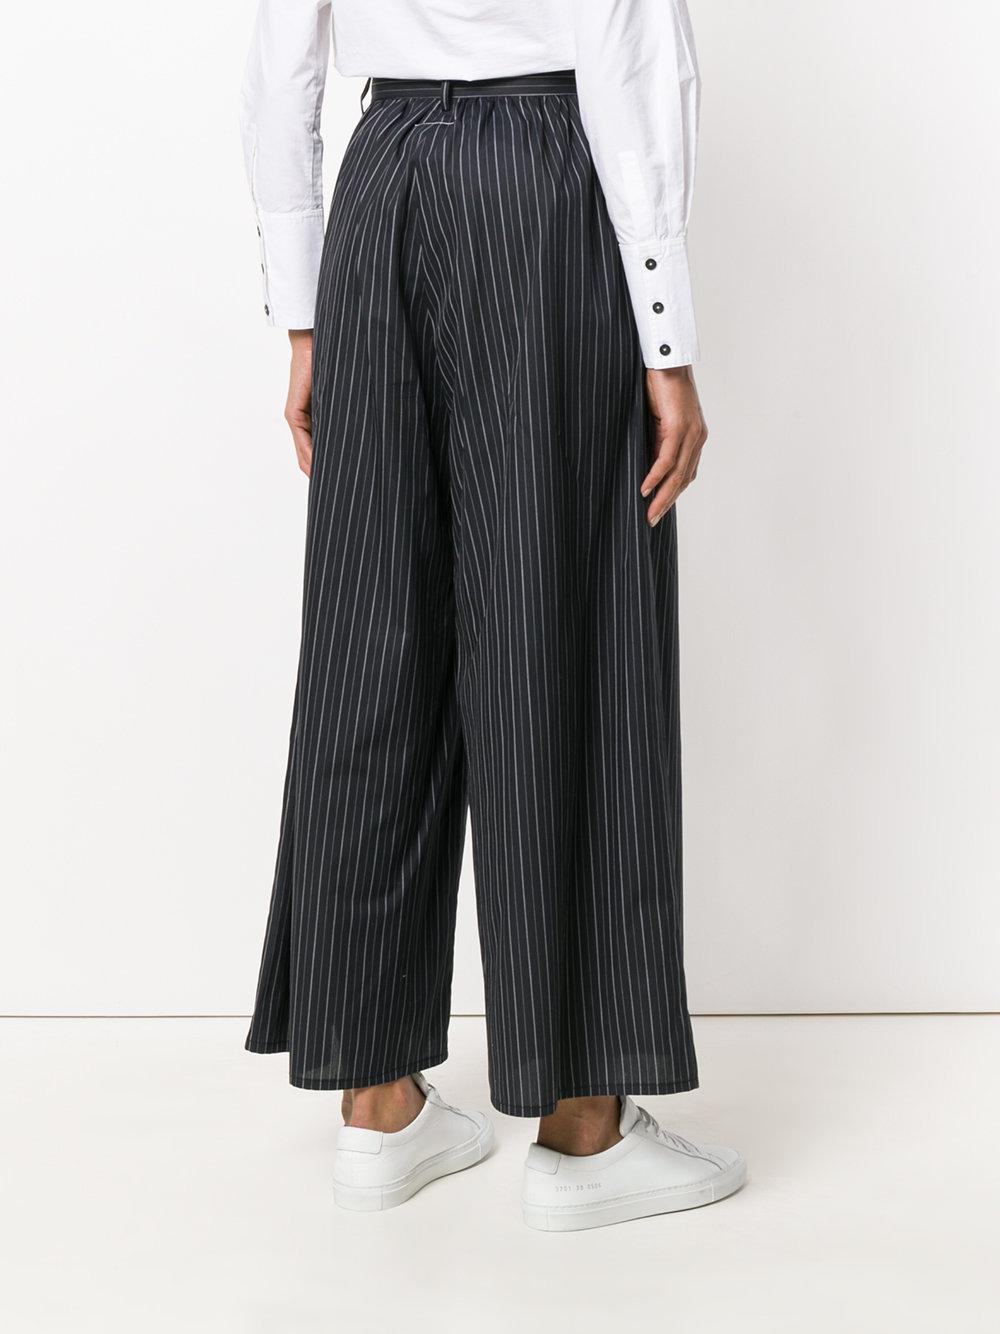 Margiela a Martin Maison rayas Negro Pantalones cortados 8UwqTBRR